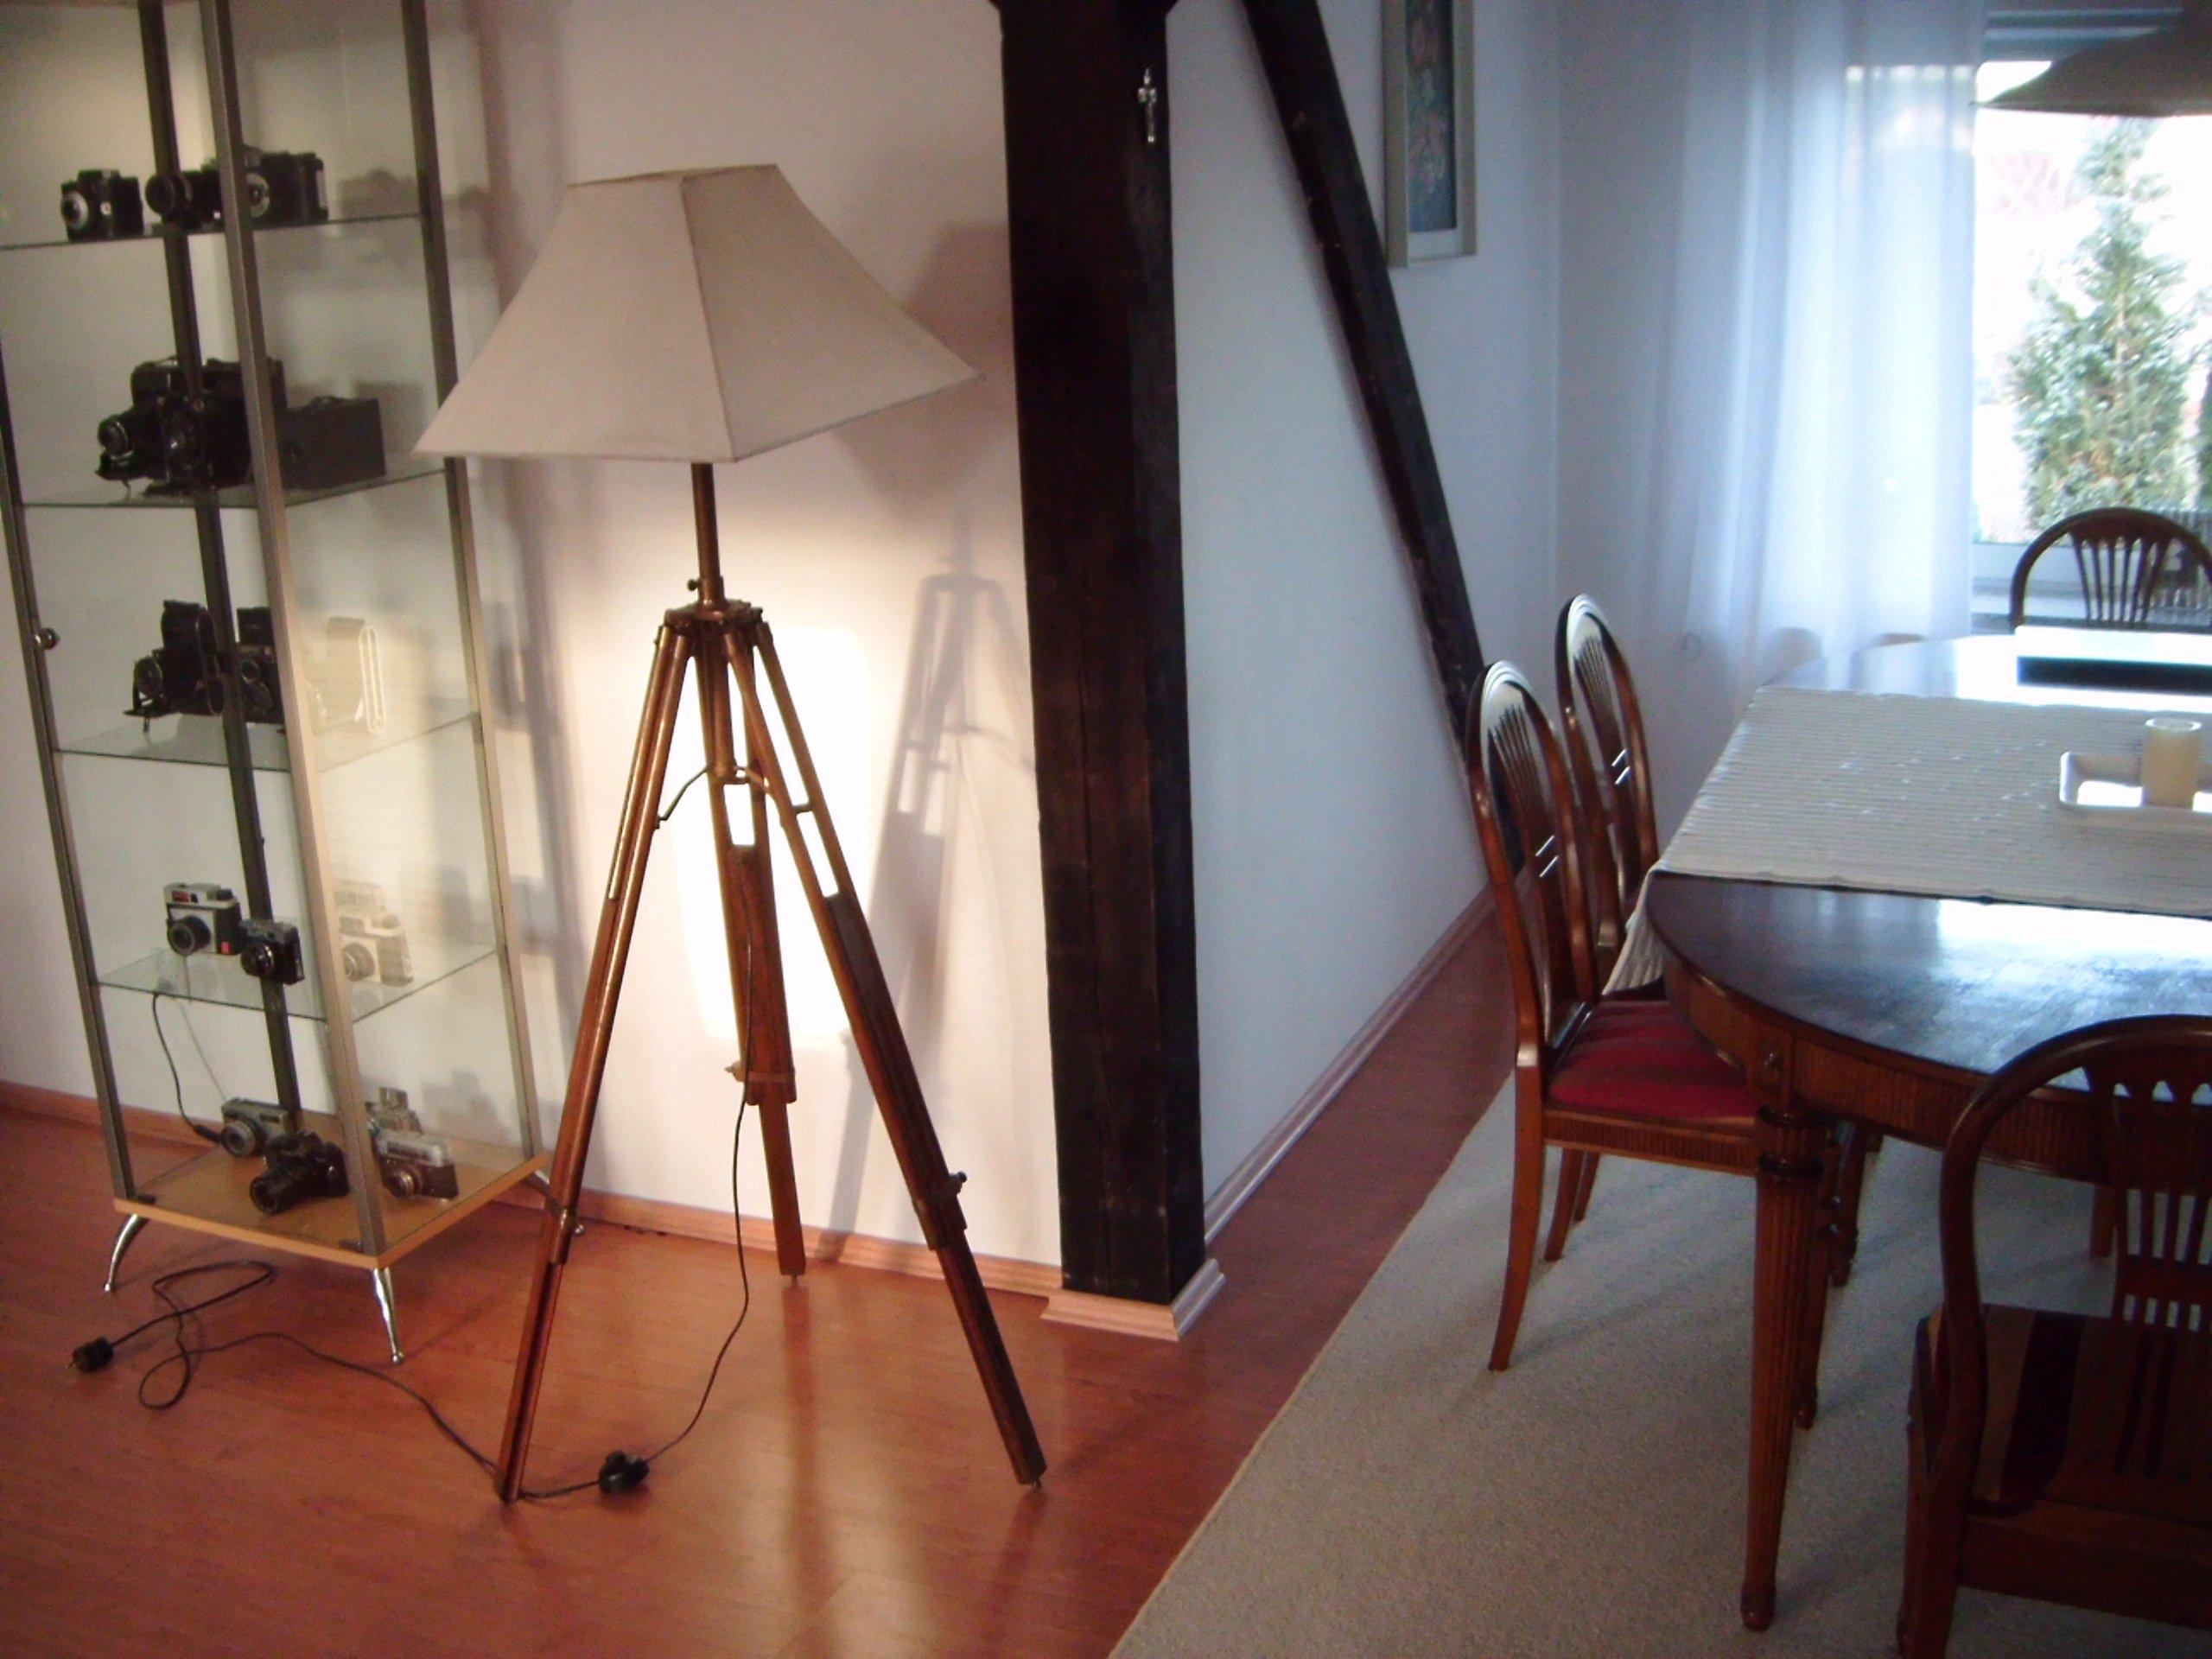 Designerska lampa na statywie